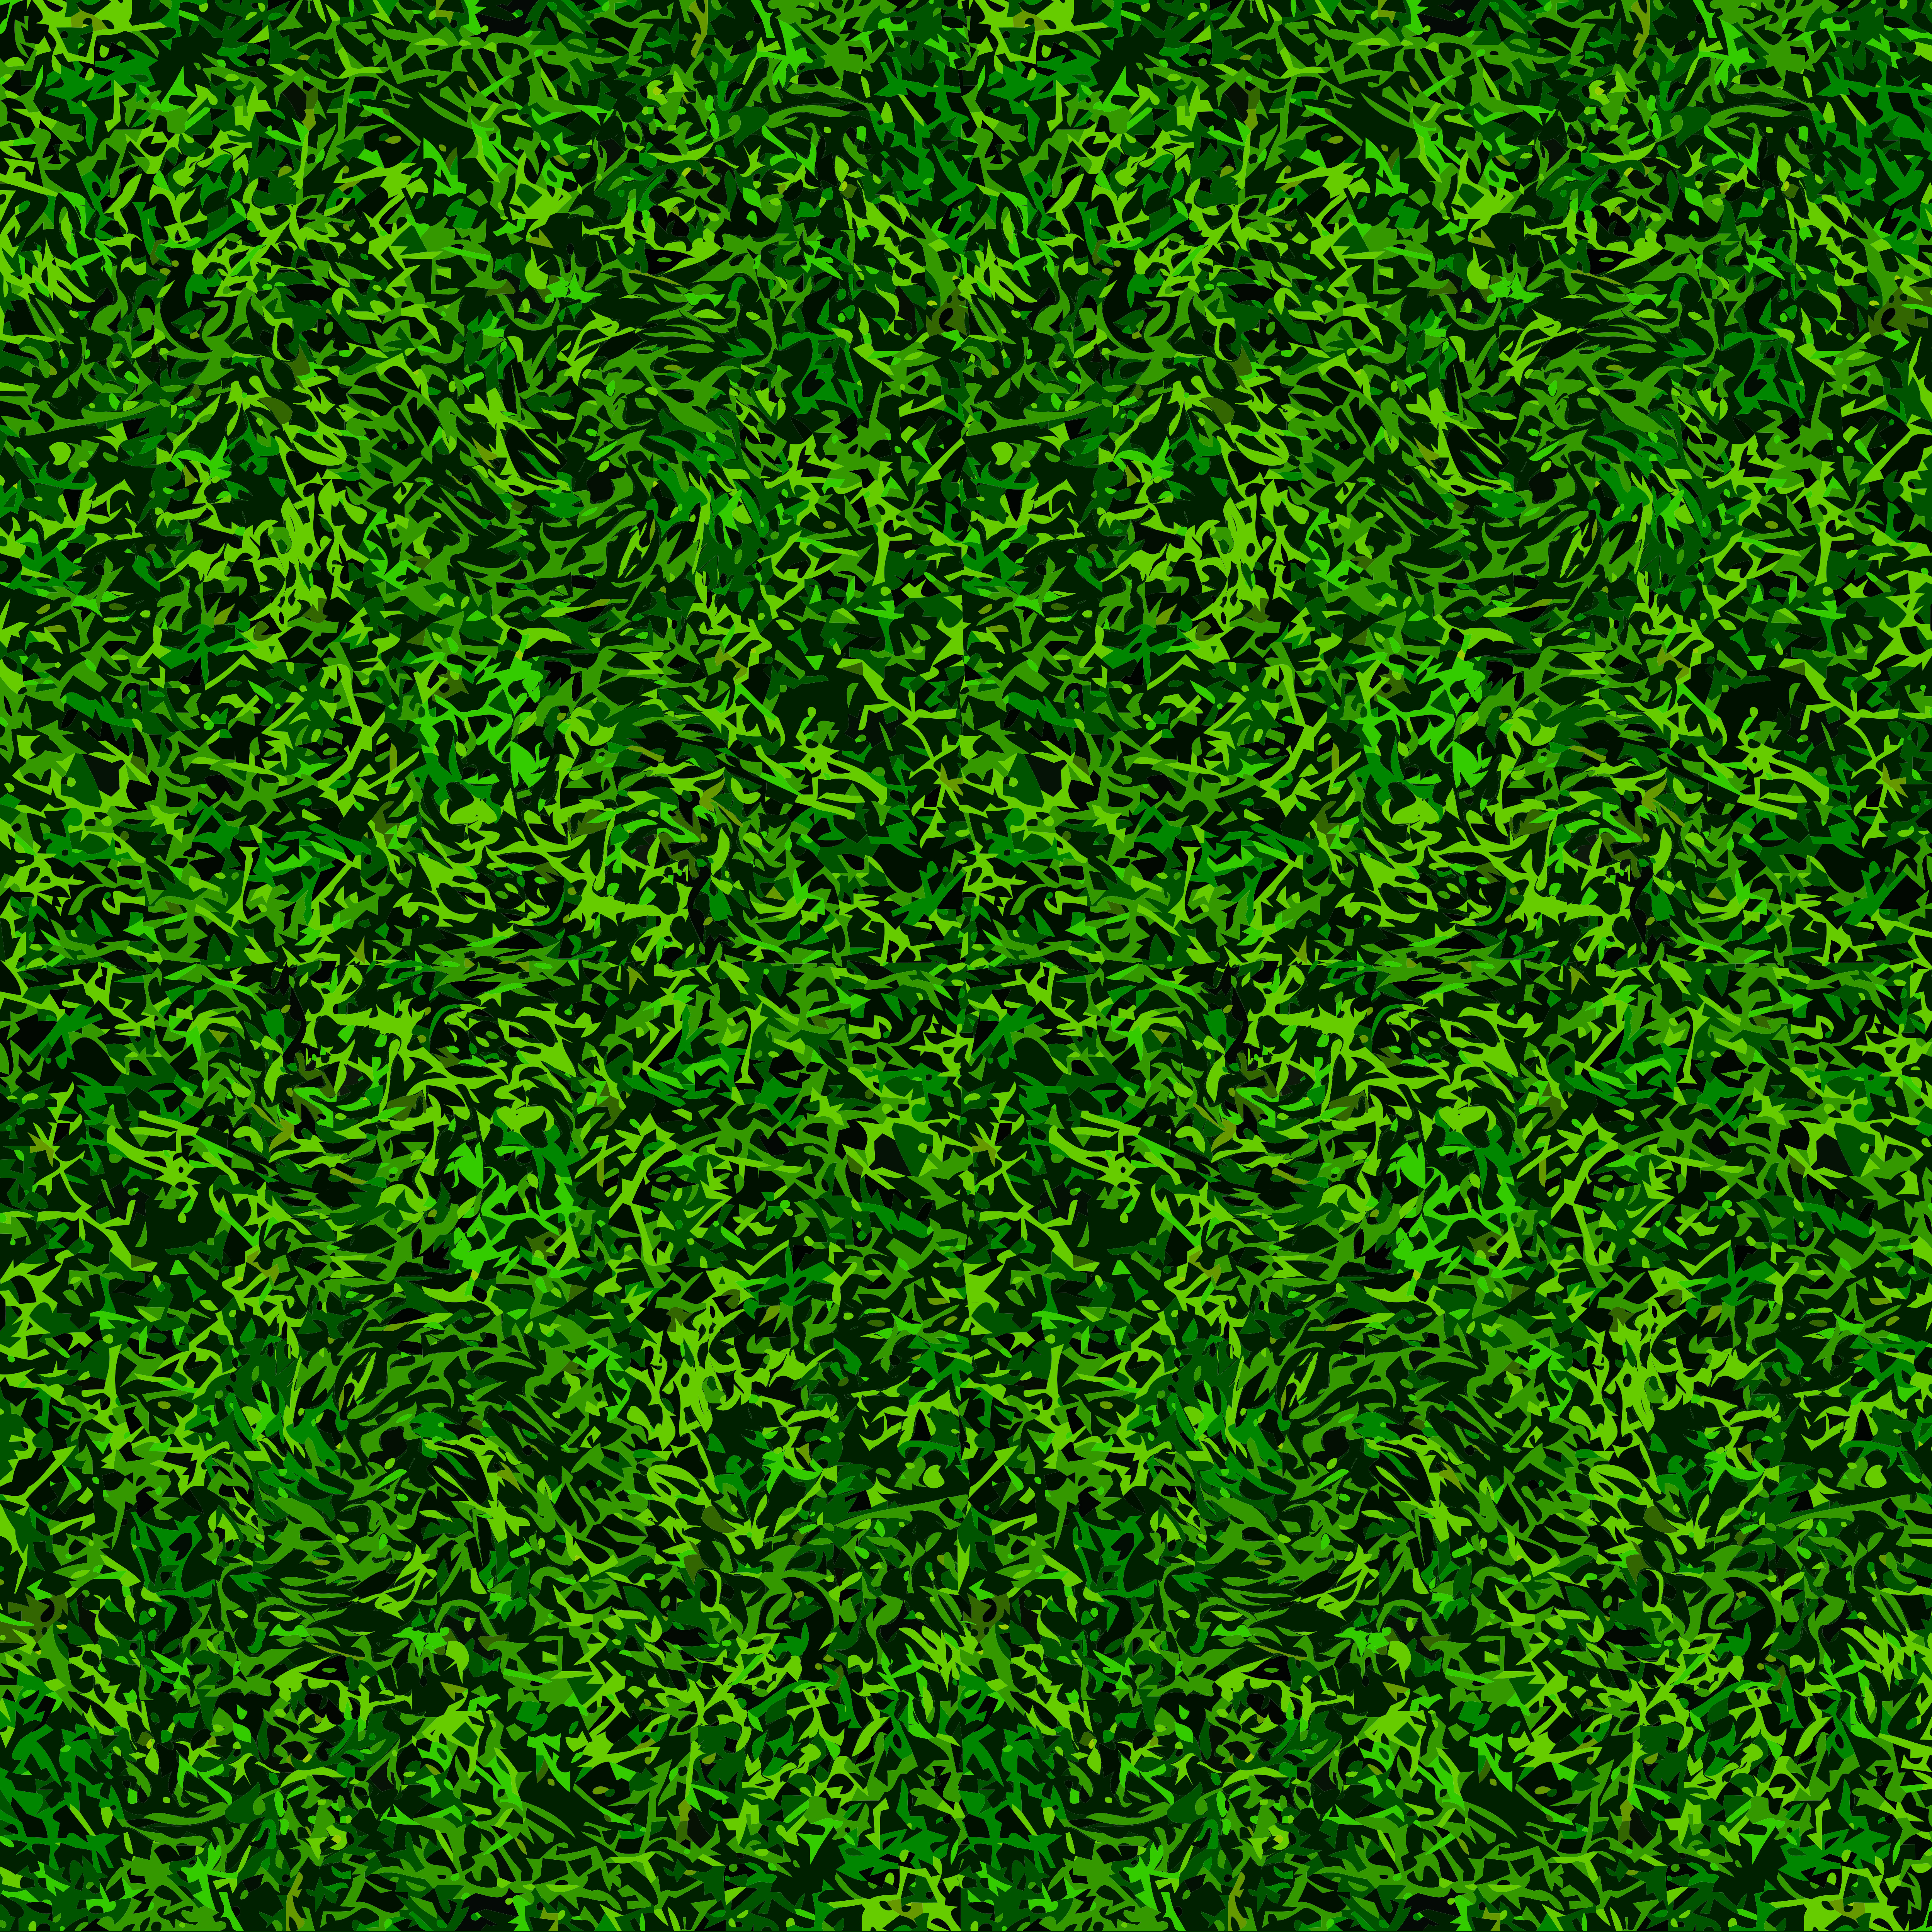 green soccer grass texture download free vectors clipart graphics vector art vecteezy